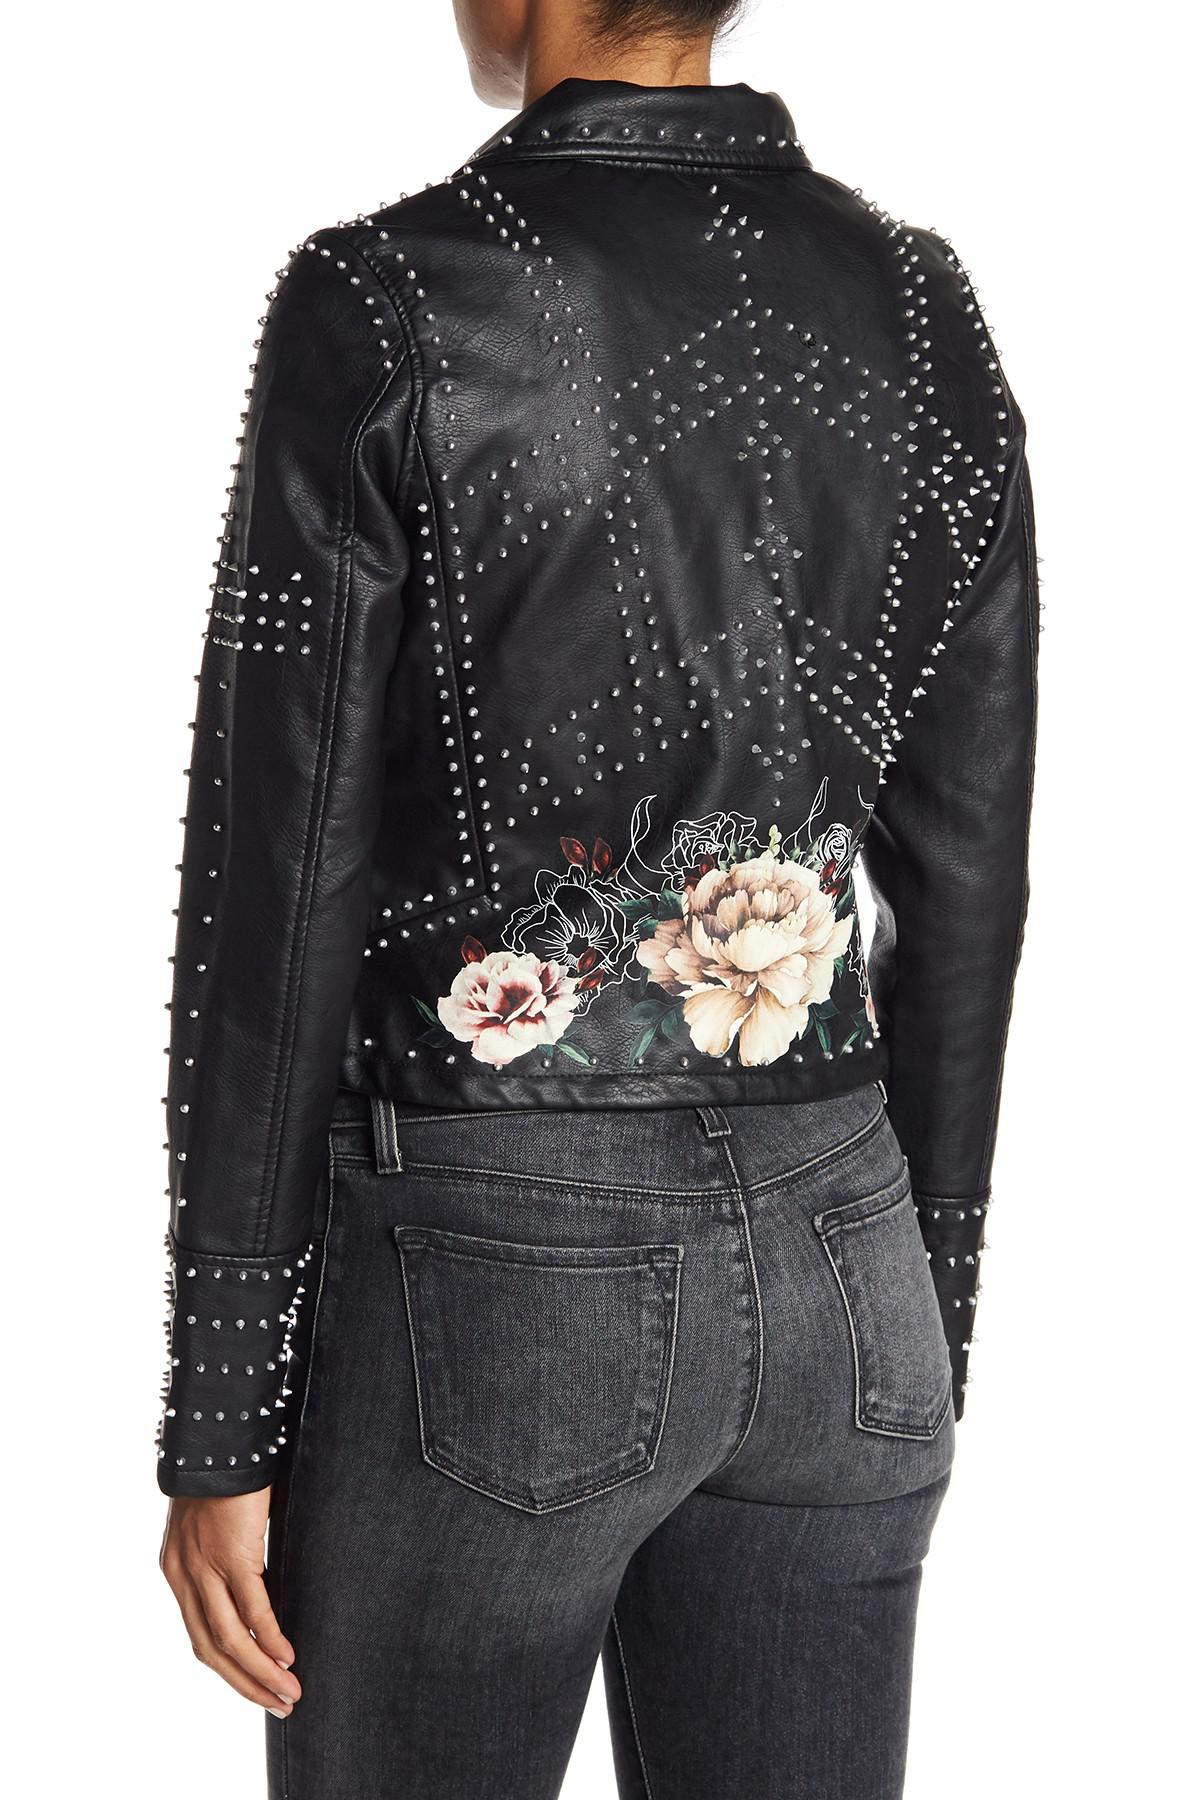 7743de535 Blank NYC Stud Floral Moto Faux Leather Jacket in Black - Lyst